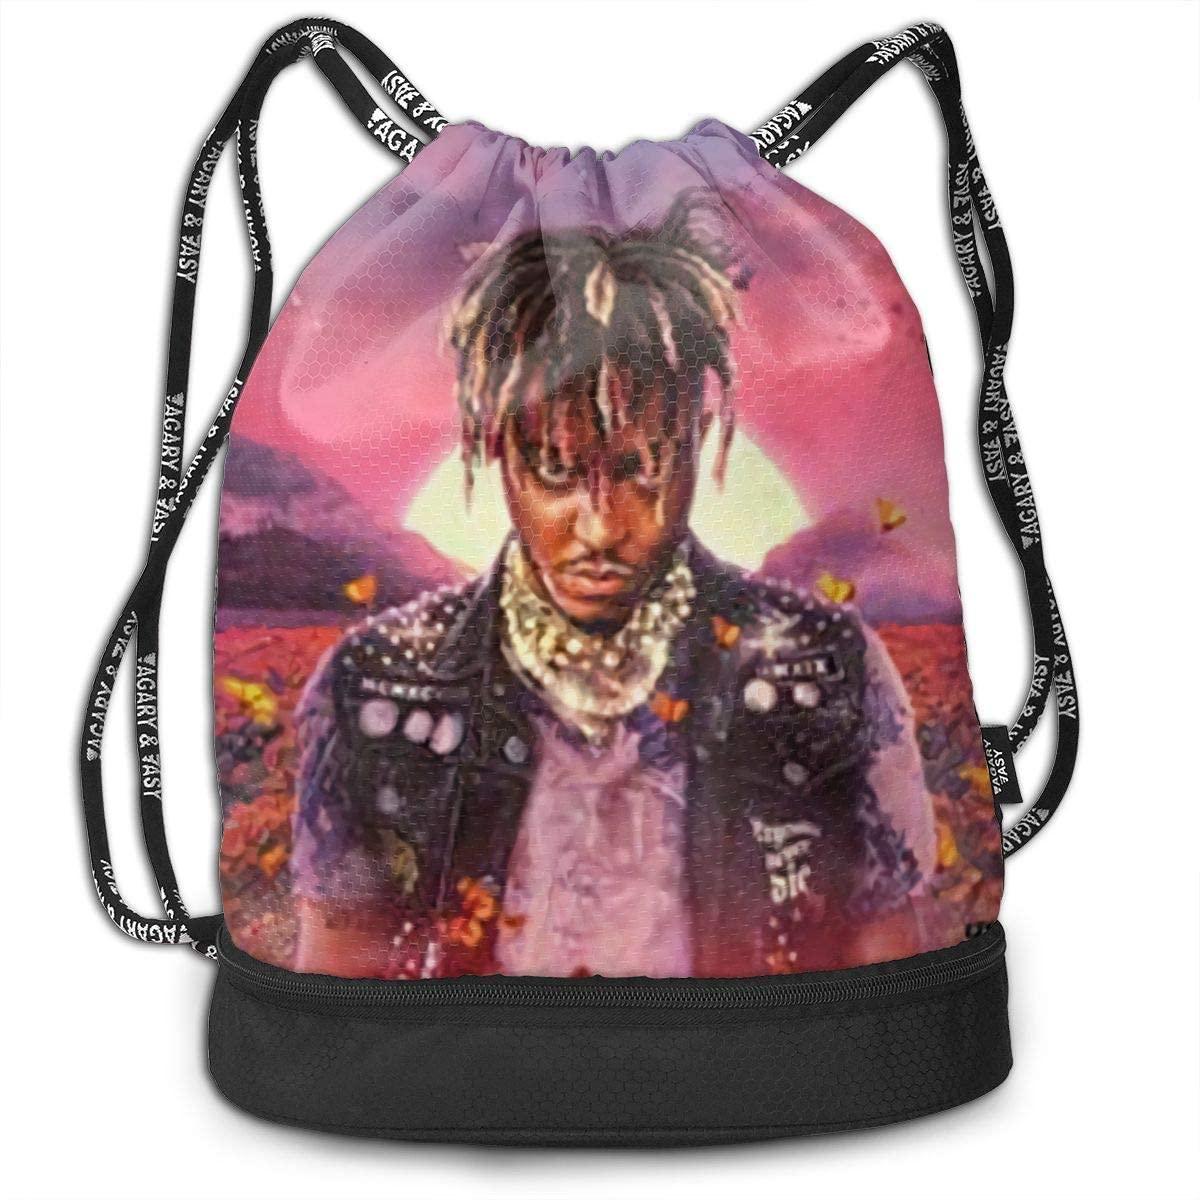 Lidanie Juice Wrld Drawstring Multifunction Backpack